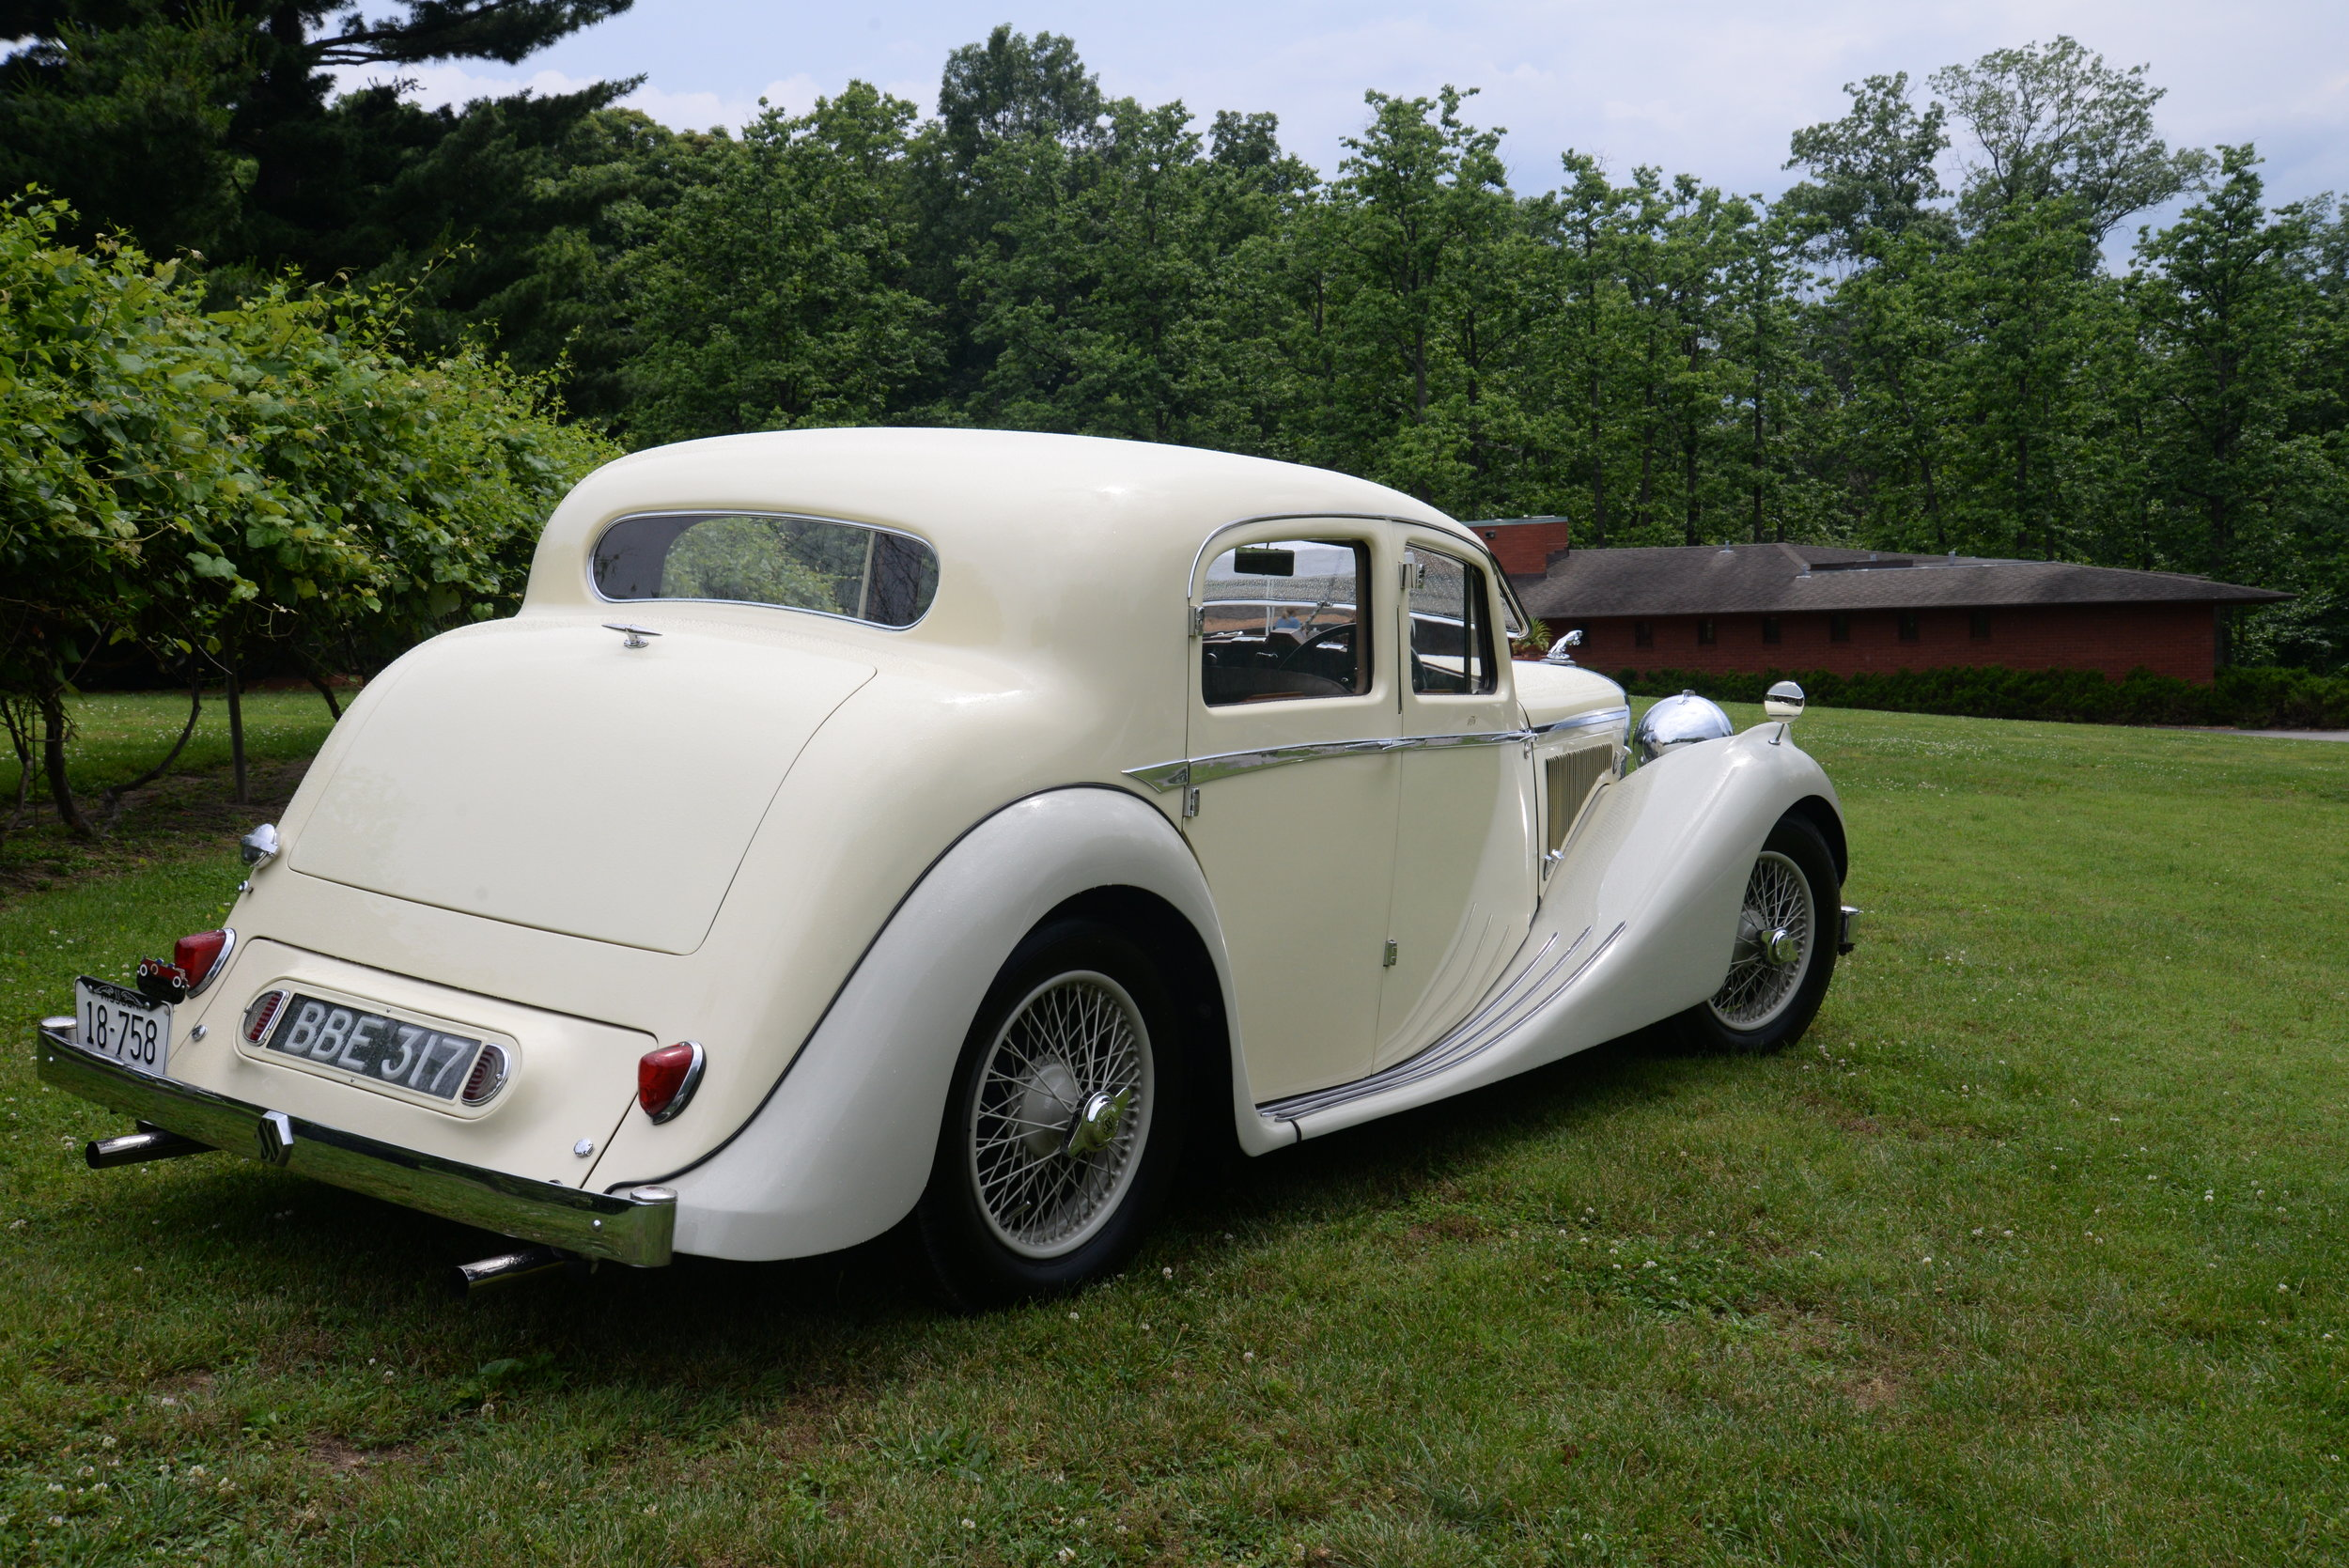 Phil Taxman's 1939 Jaguar SS Saloon